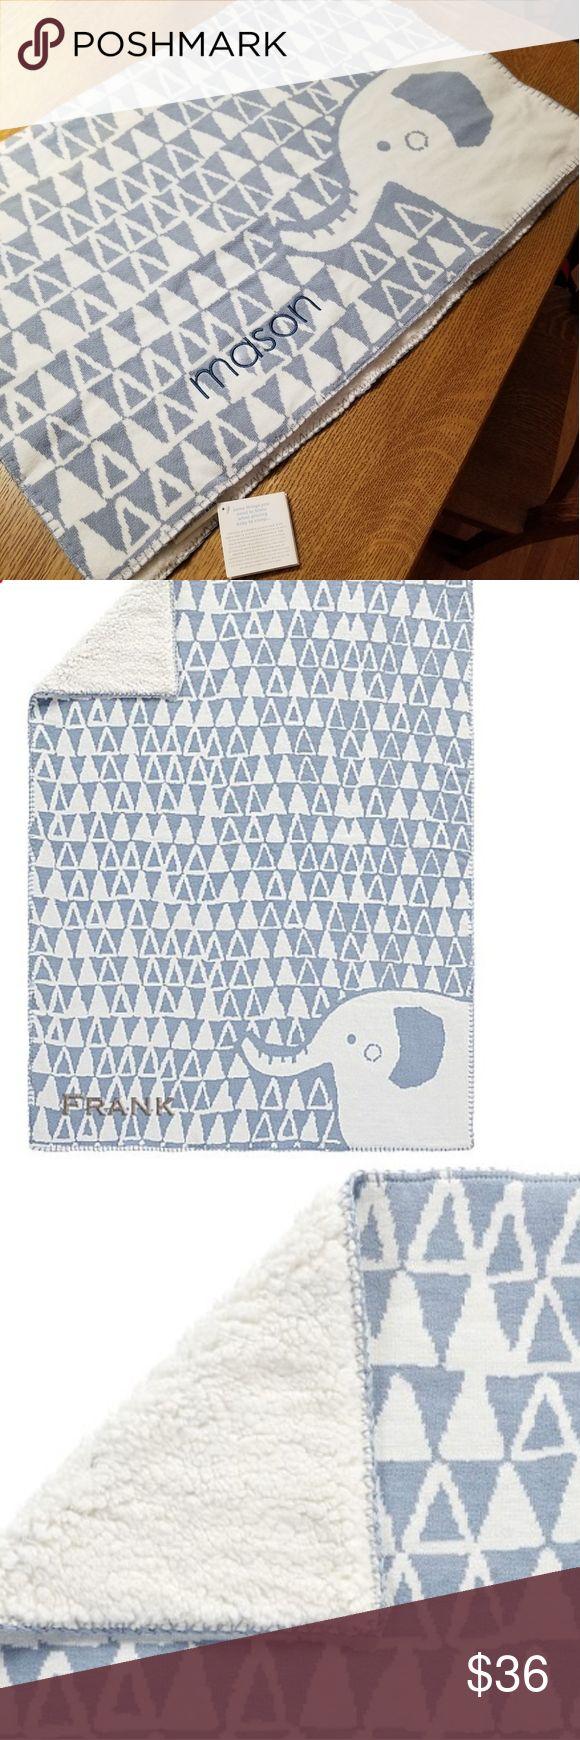 Pottery Barn Elephant Knit Sherpa baby blanket NWT